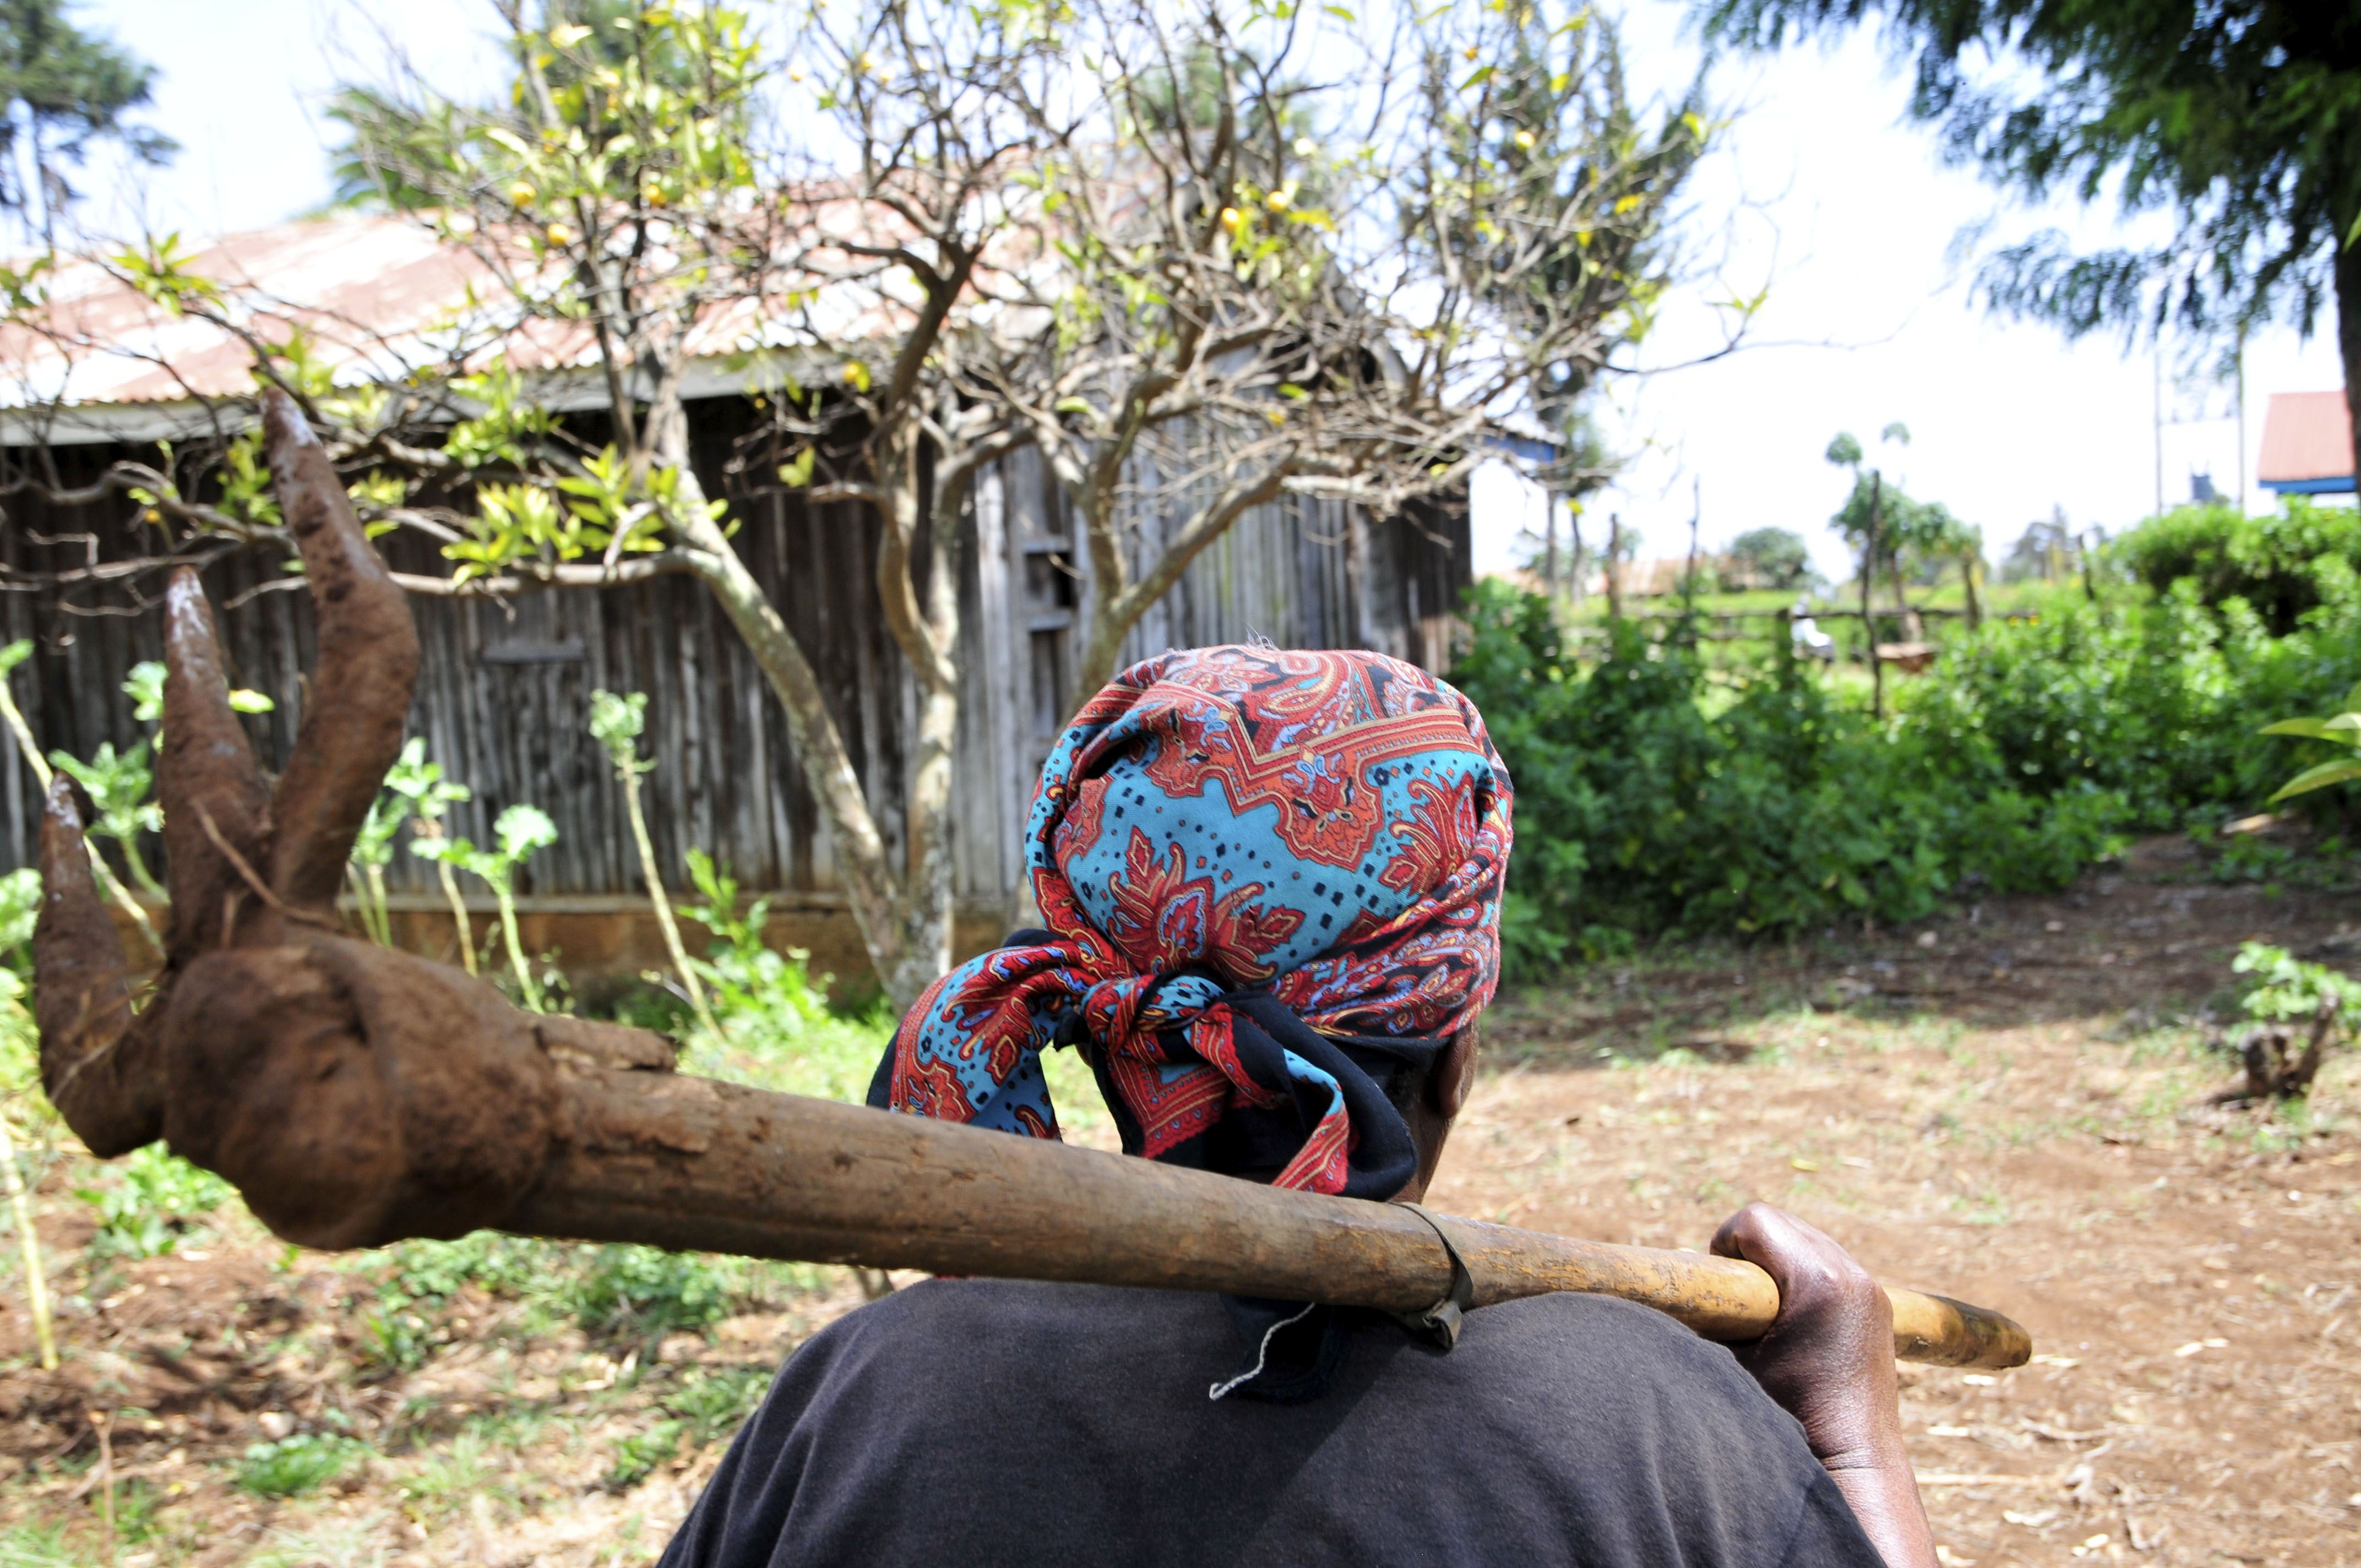 Farmer in the Mount Kenya region. (Neil Palmer with CIAT via Flickr)